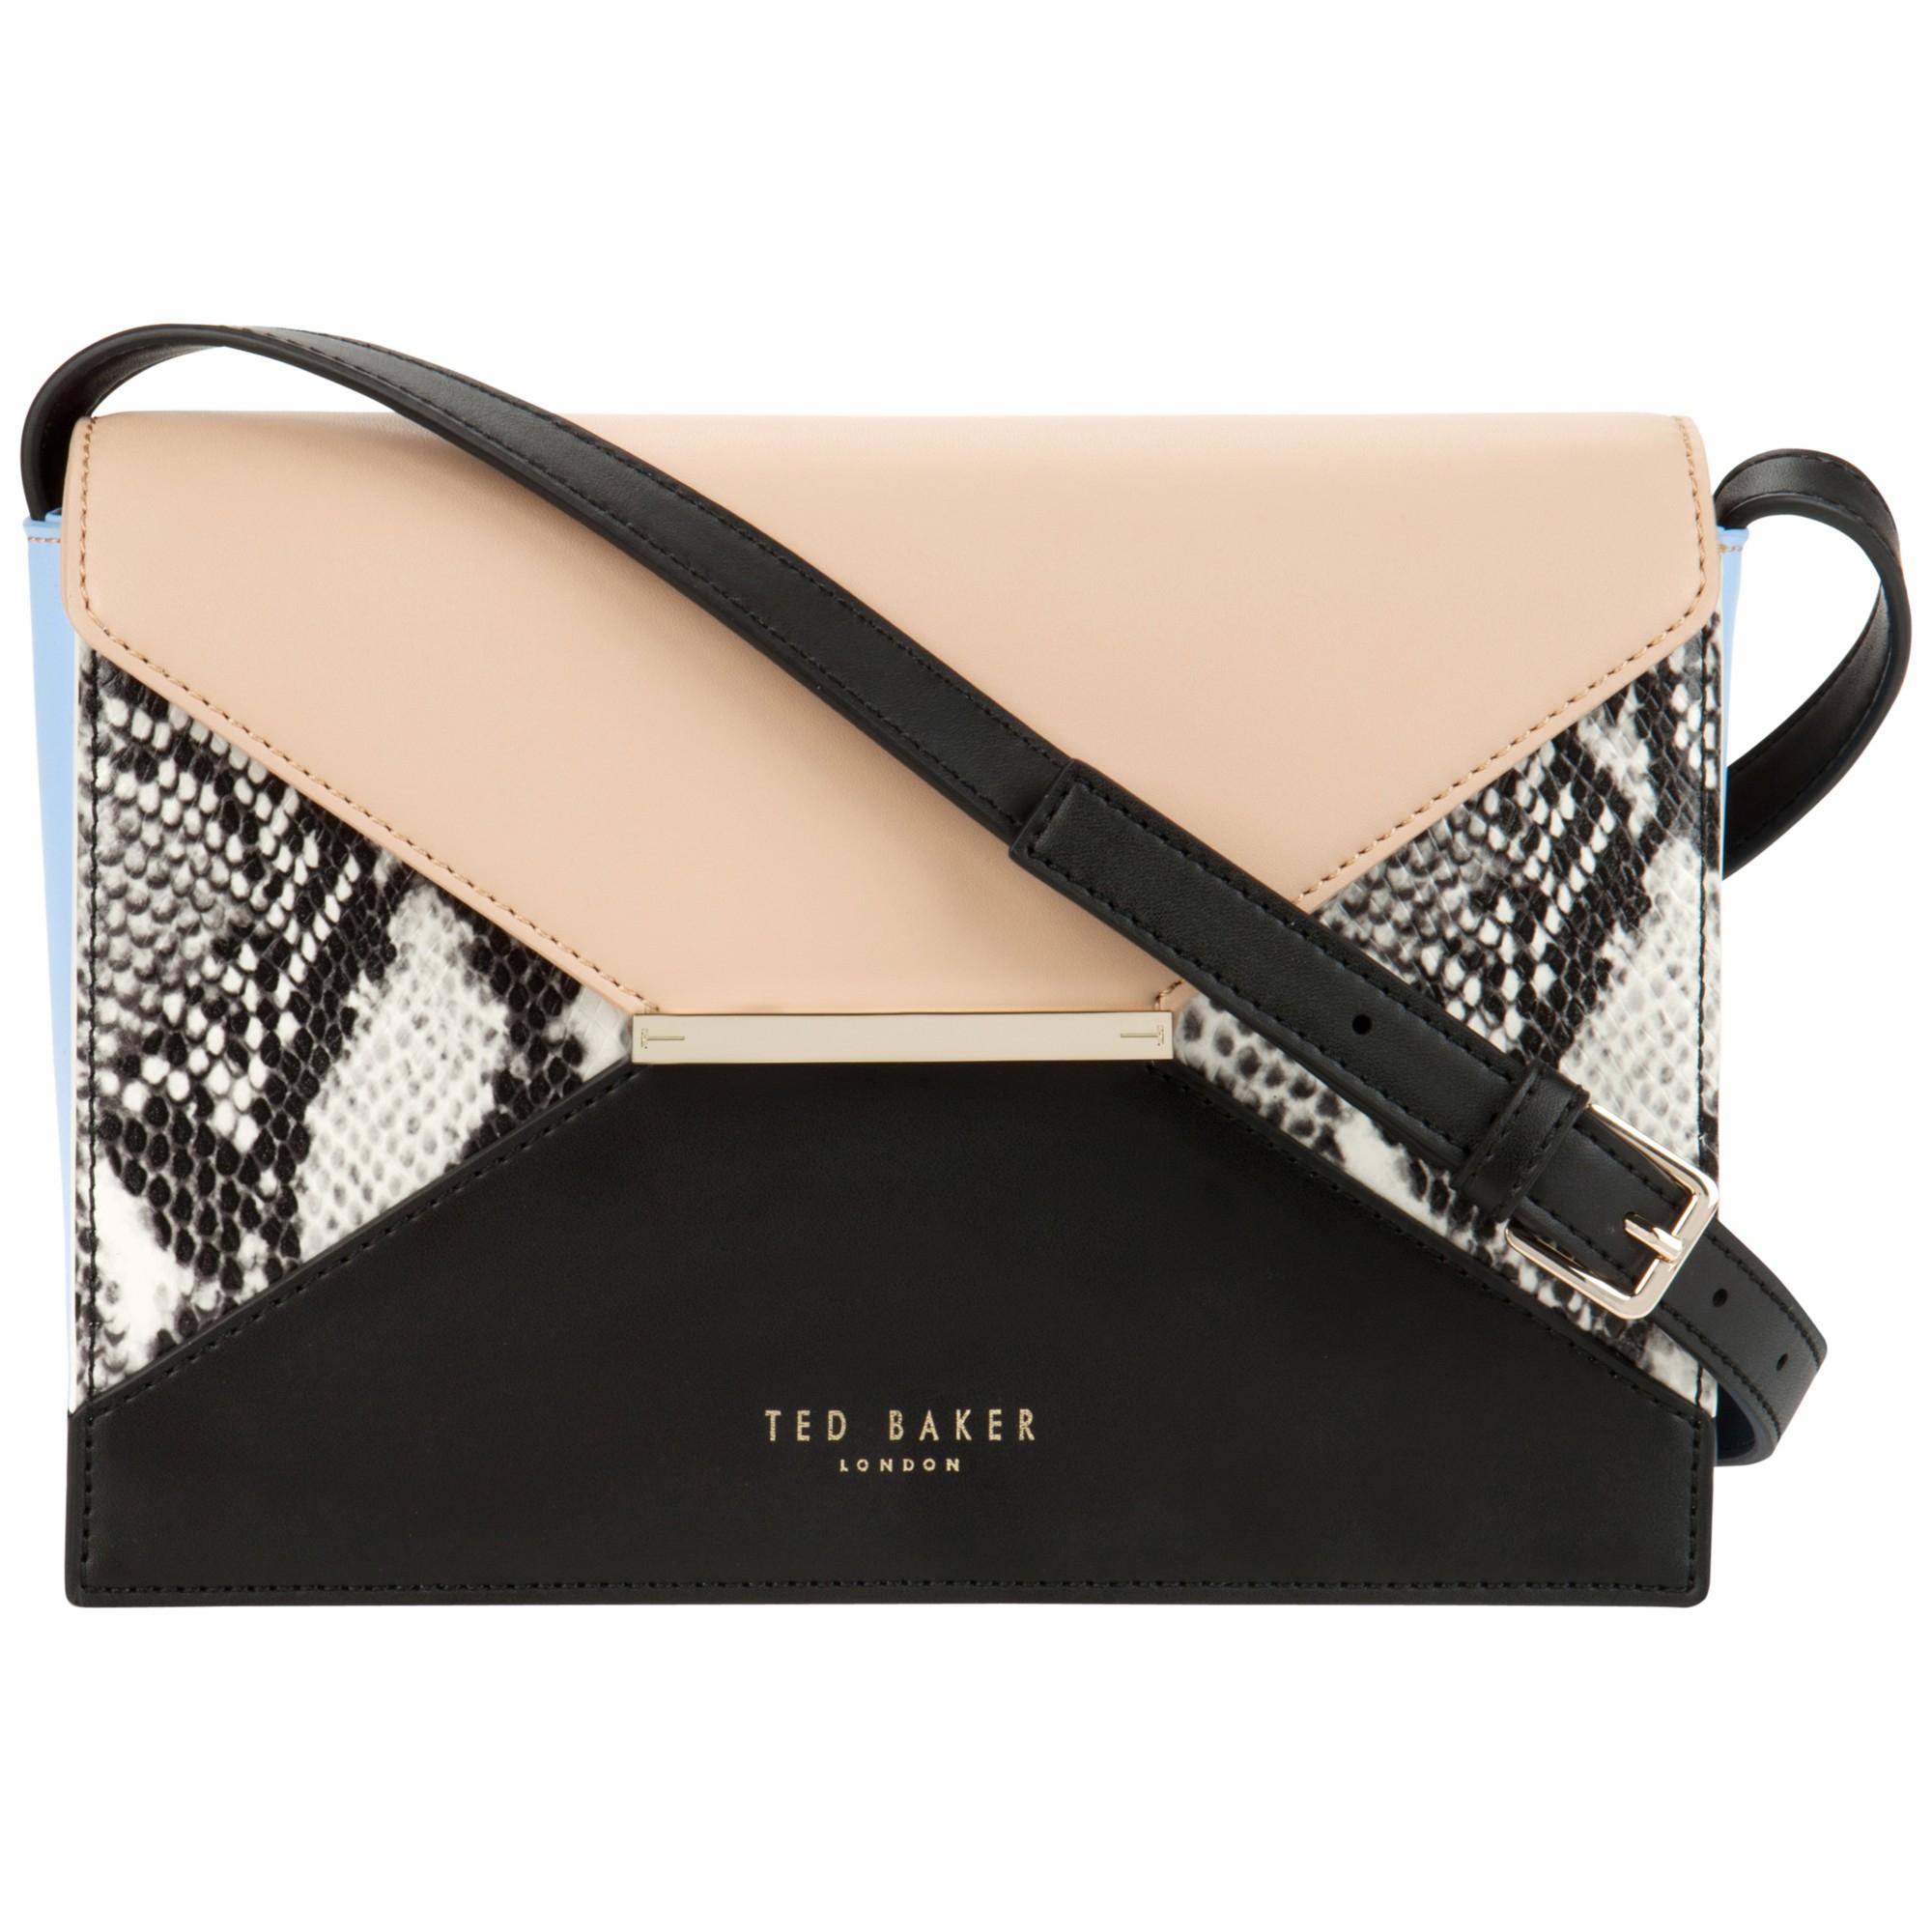 Ted Baker Tuileyy Colour Block Shoulder Bag in Beige (powder)